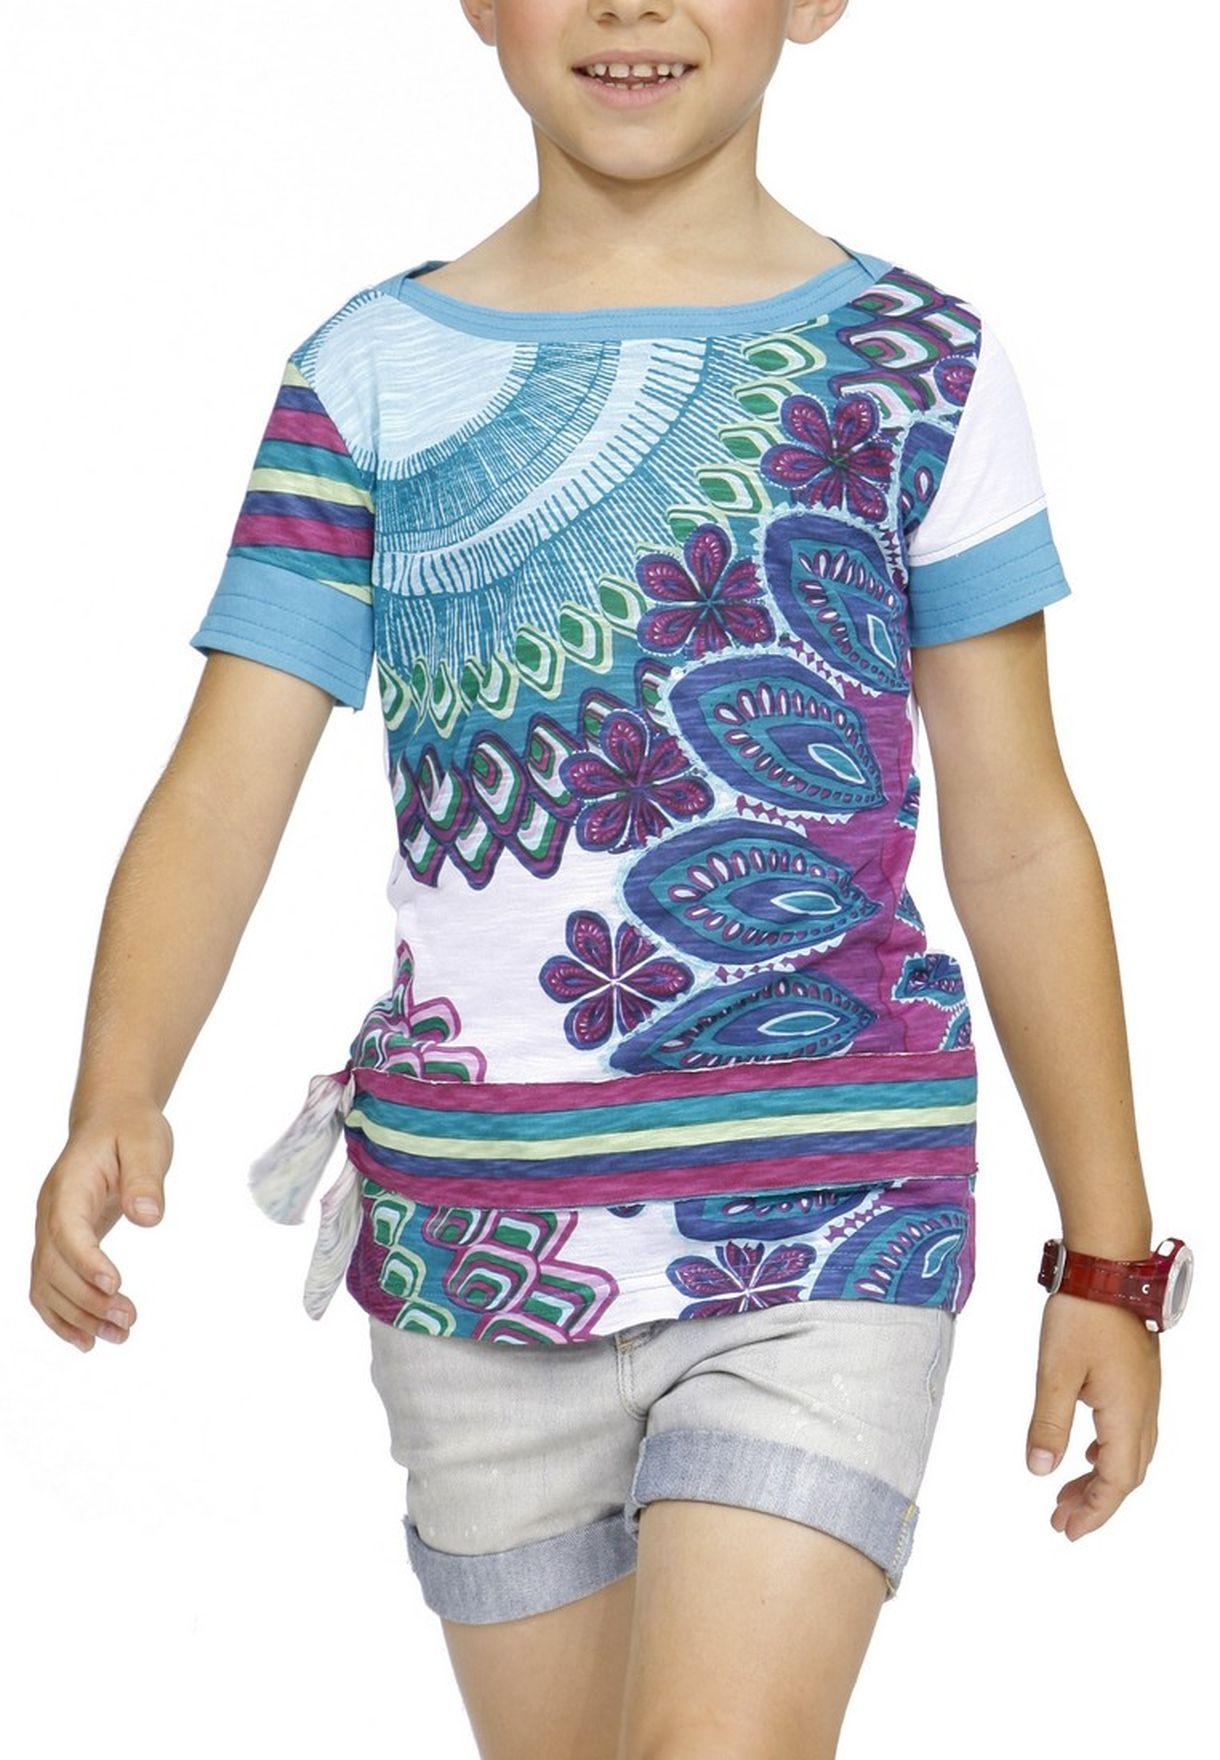 Andrea Multicolor Kids Shop Uae In T For Shirt Desigual p61nwxqtA